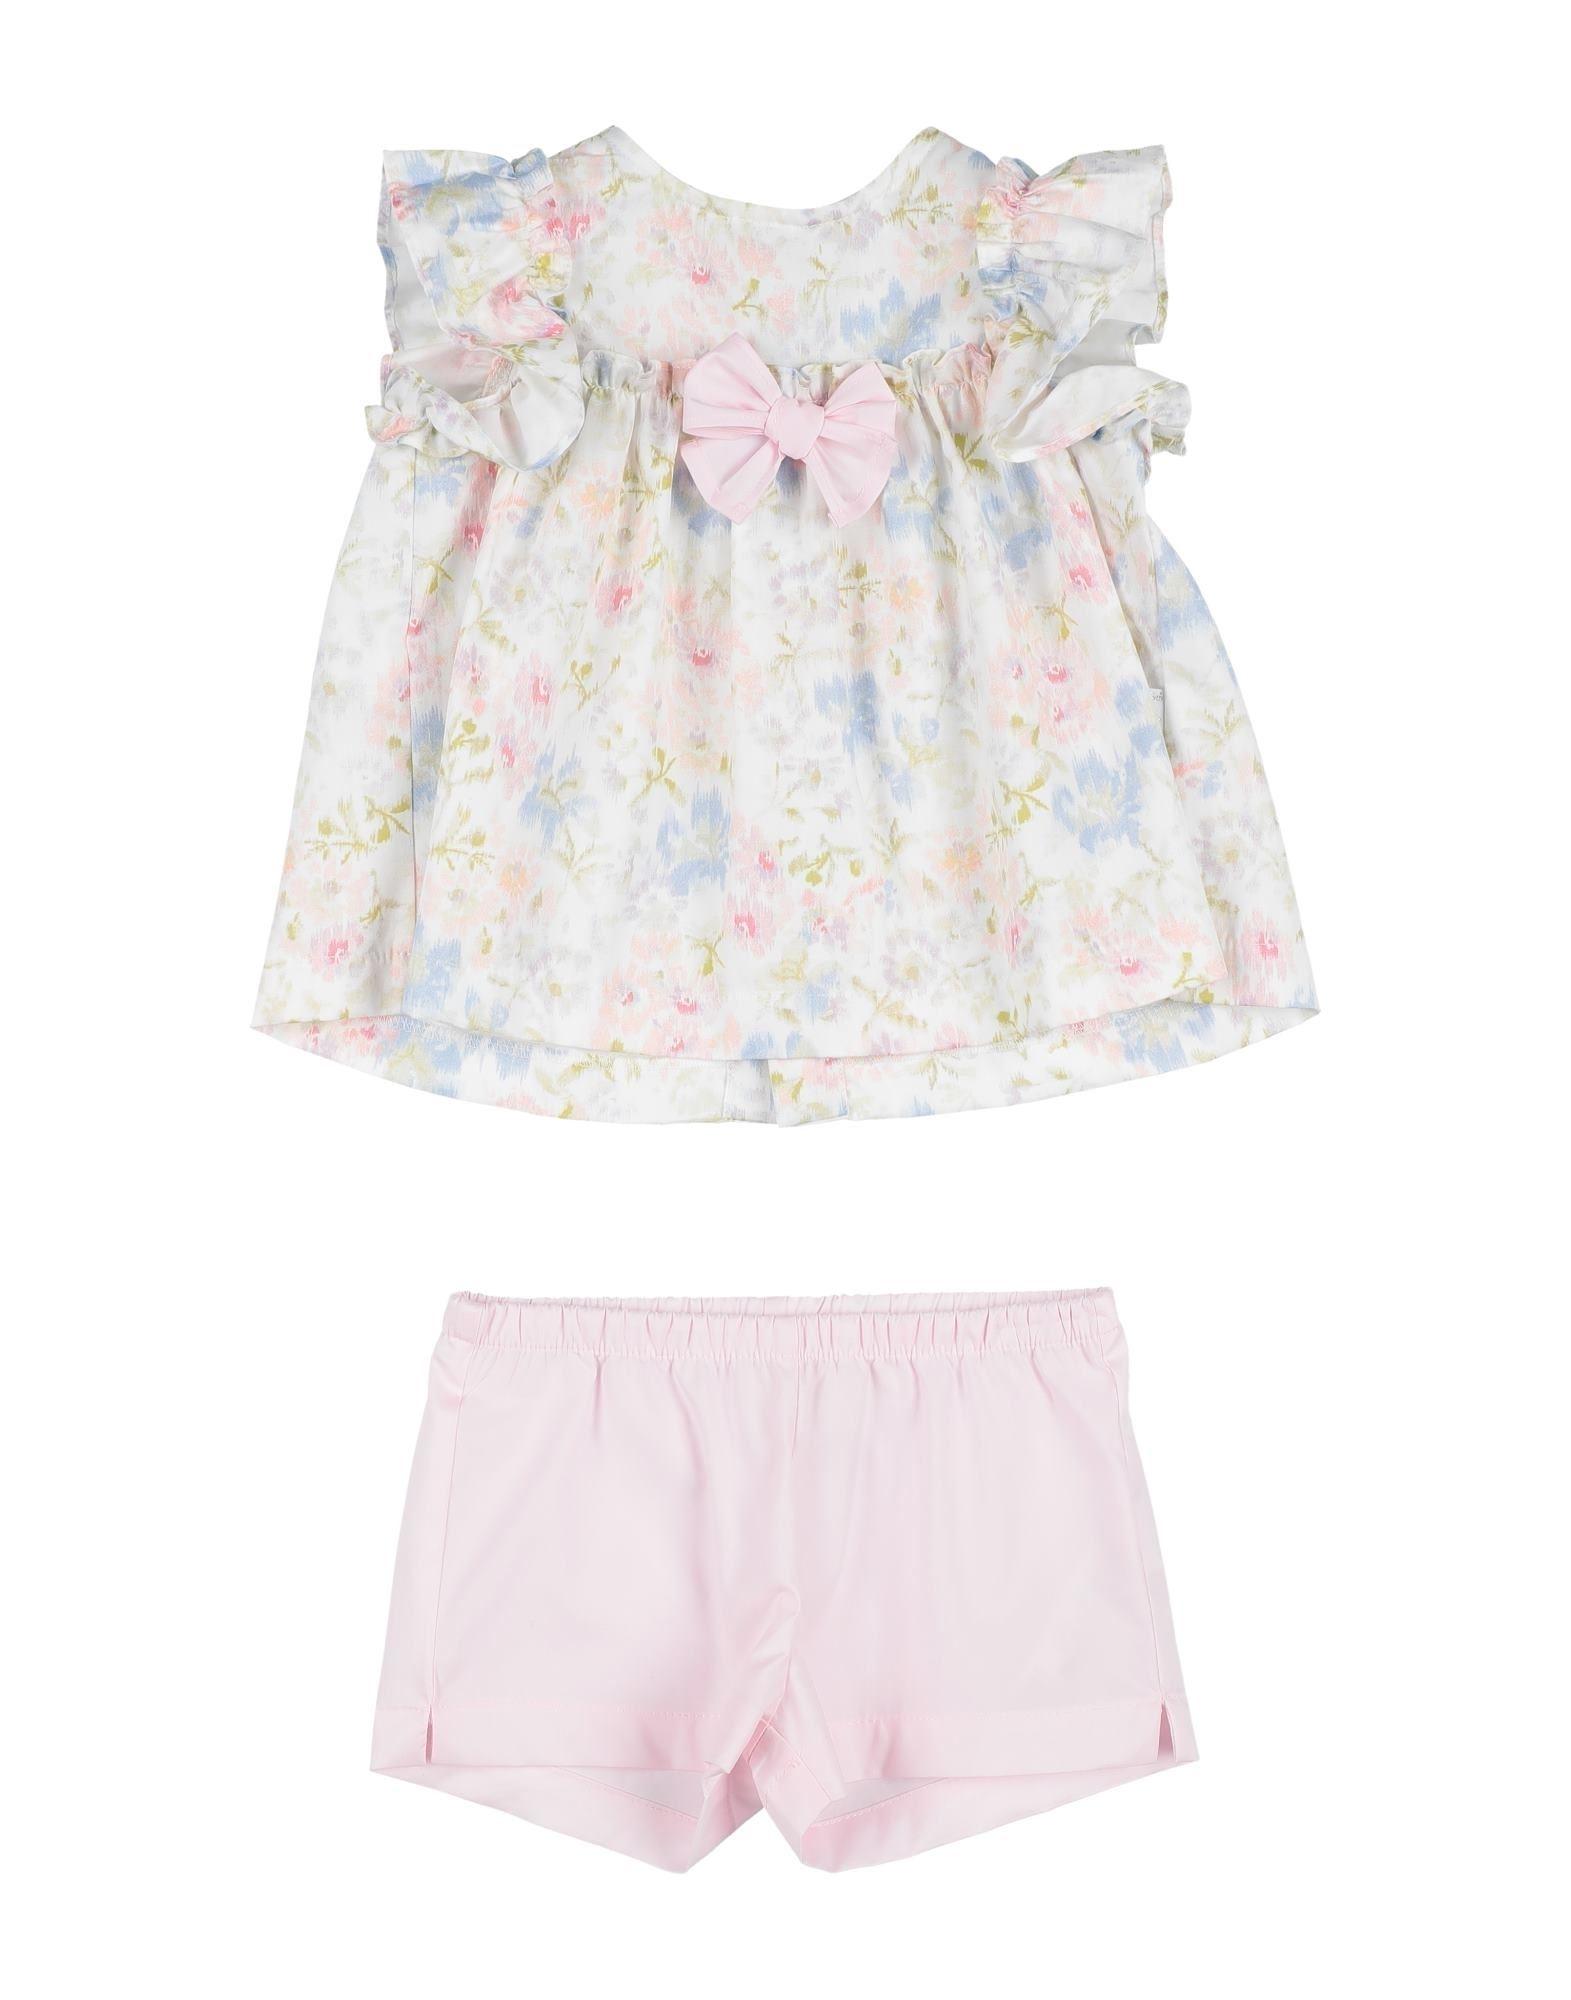 IL GUFO Комплект для малыша комплект одежды il gufo размер 110 белый